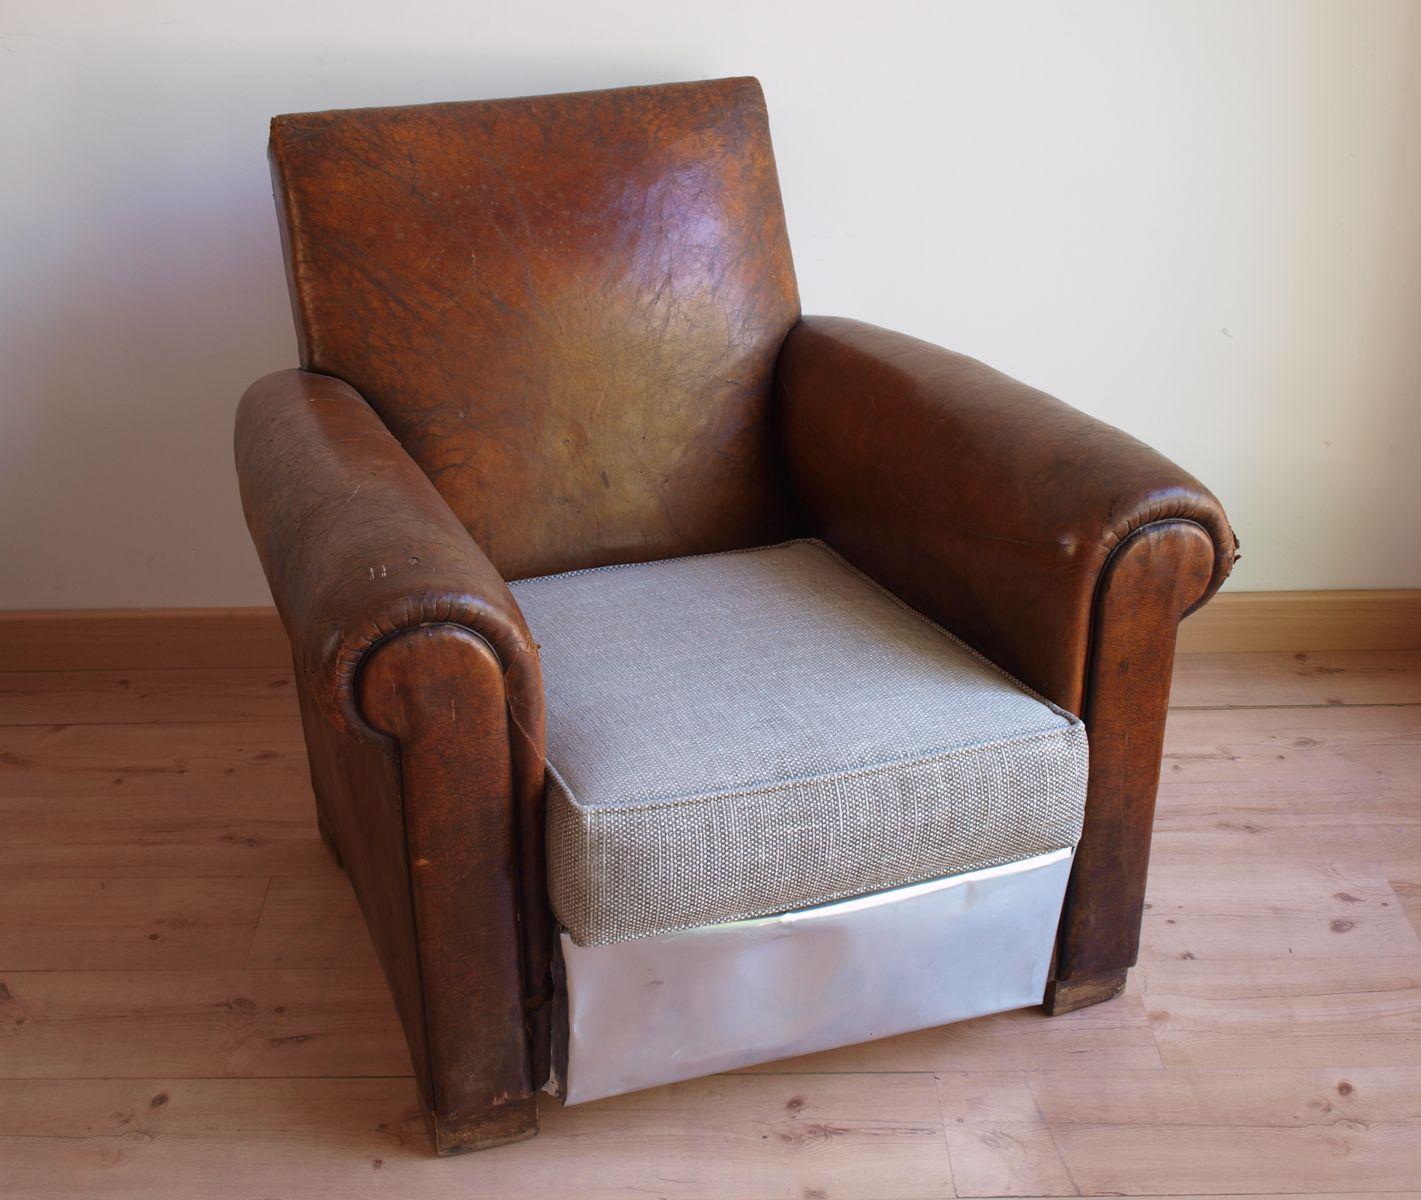 vintage club zink und leder sessel bei pamono kaufen. Black Bedroom Furniture Sets. Home Design Ideas